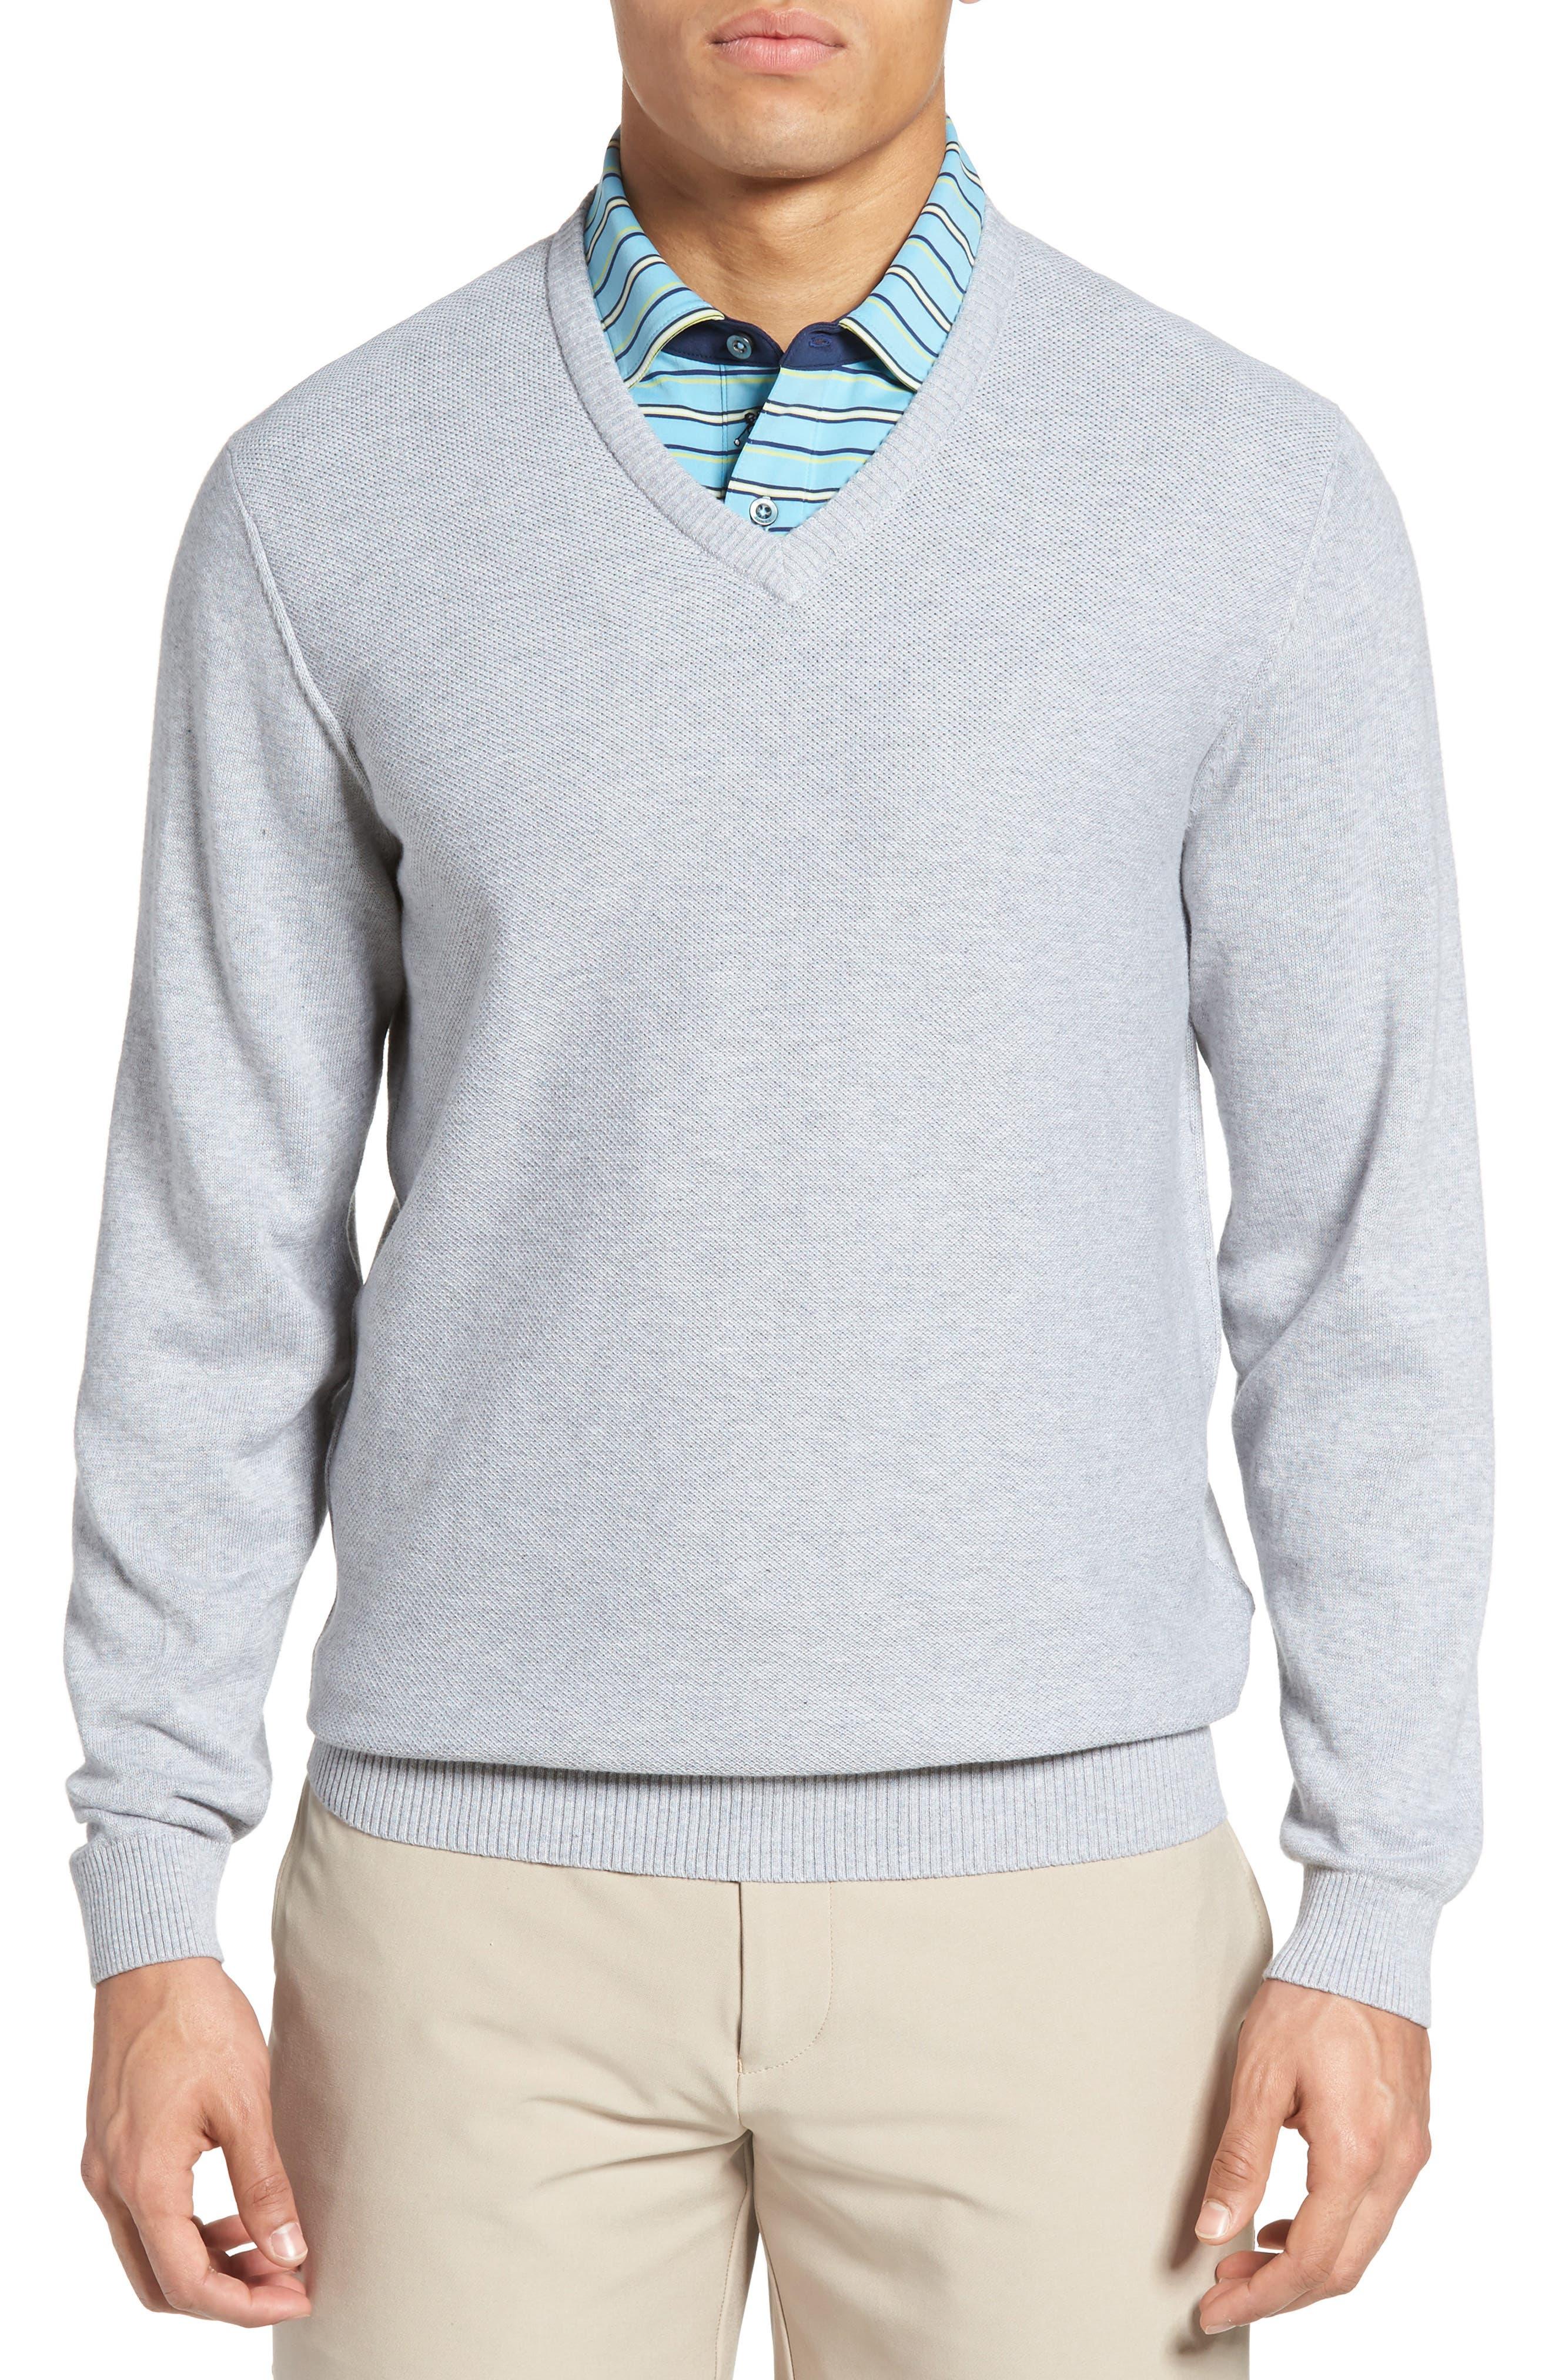 Piqué Jersey V-Neck Sweater,                             Main thumbnail 1, color,                             078